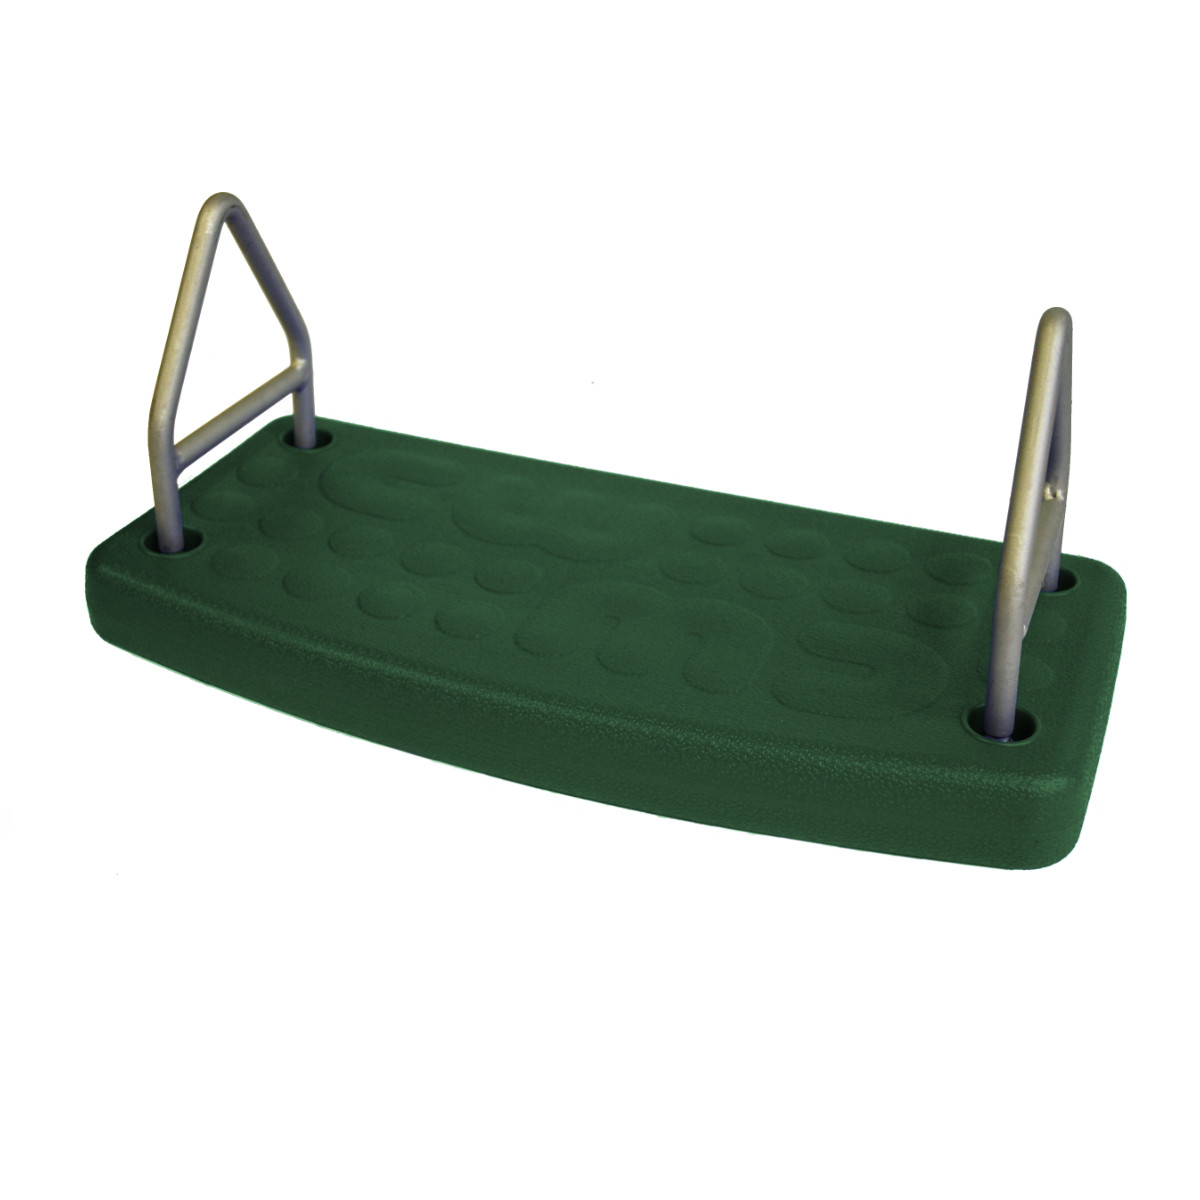 Molded Flat Swing Seat - Green